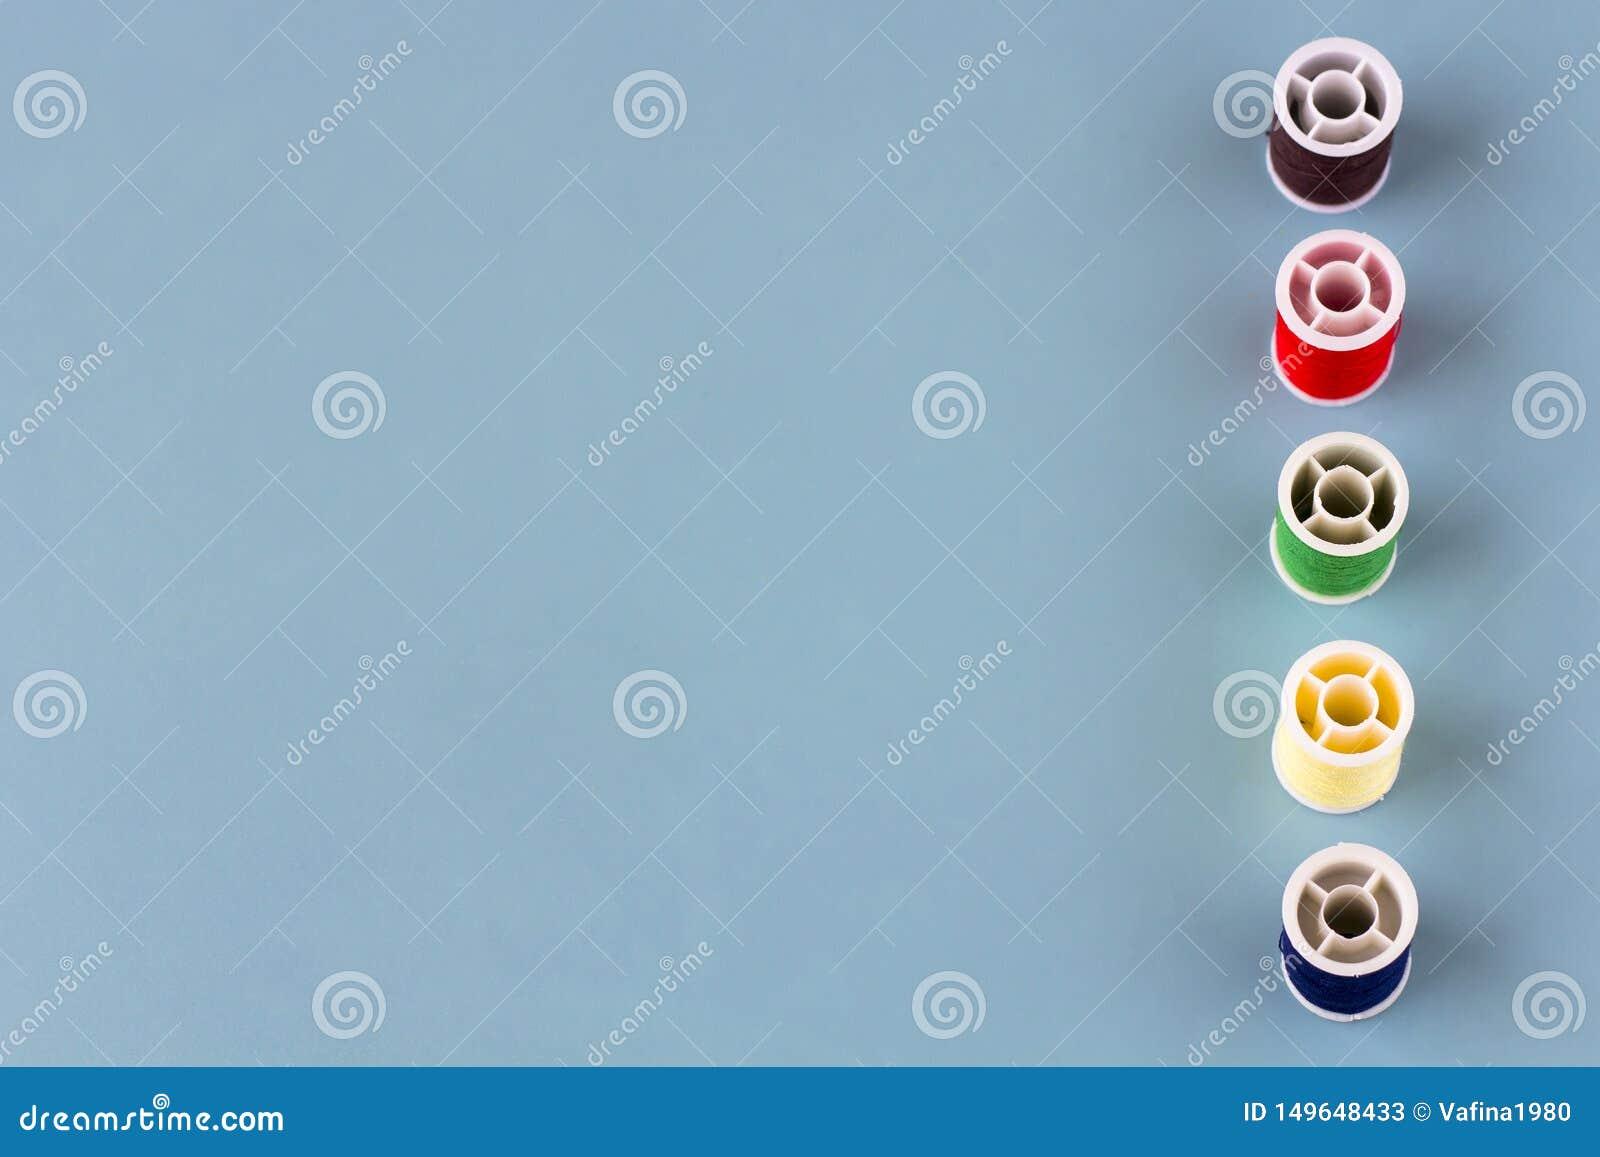 Spoelen van gekleurde draad